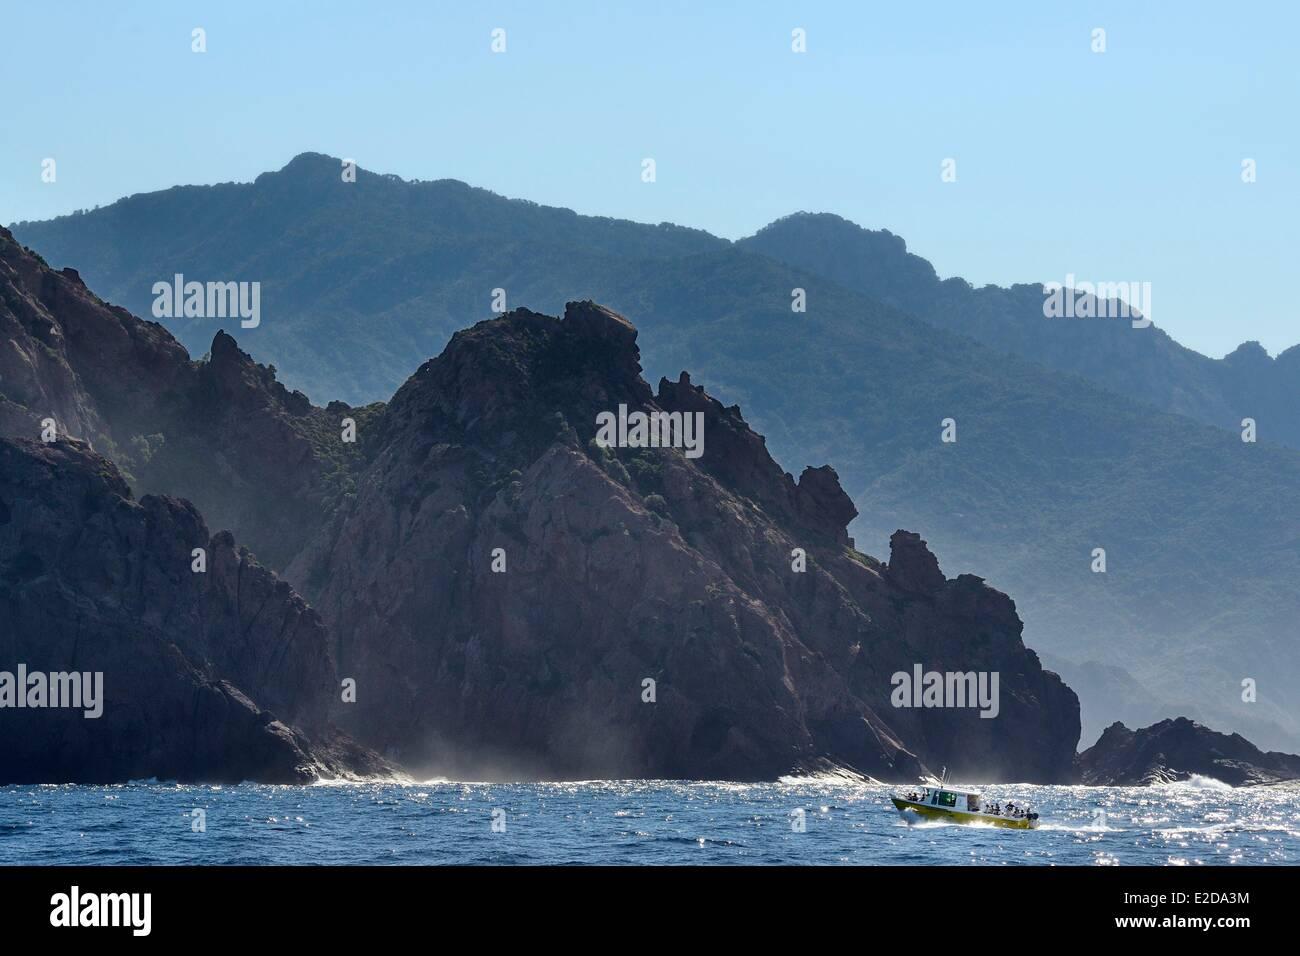 Frankreich, Corse du Sud, Golfe de Girolata, Weltkulturerbe der UNESCO, der Capo Senino Stockbild